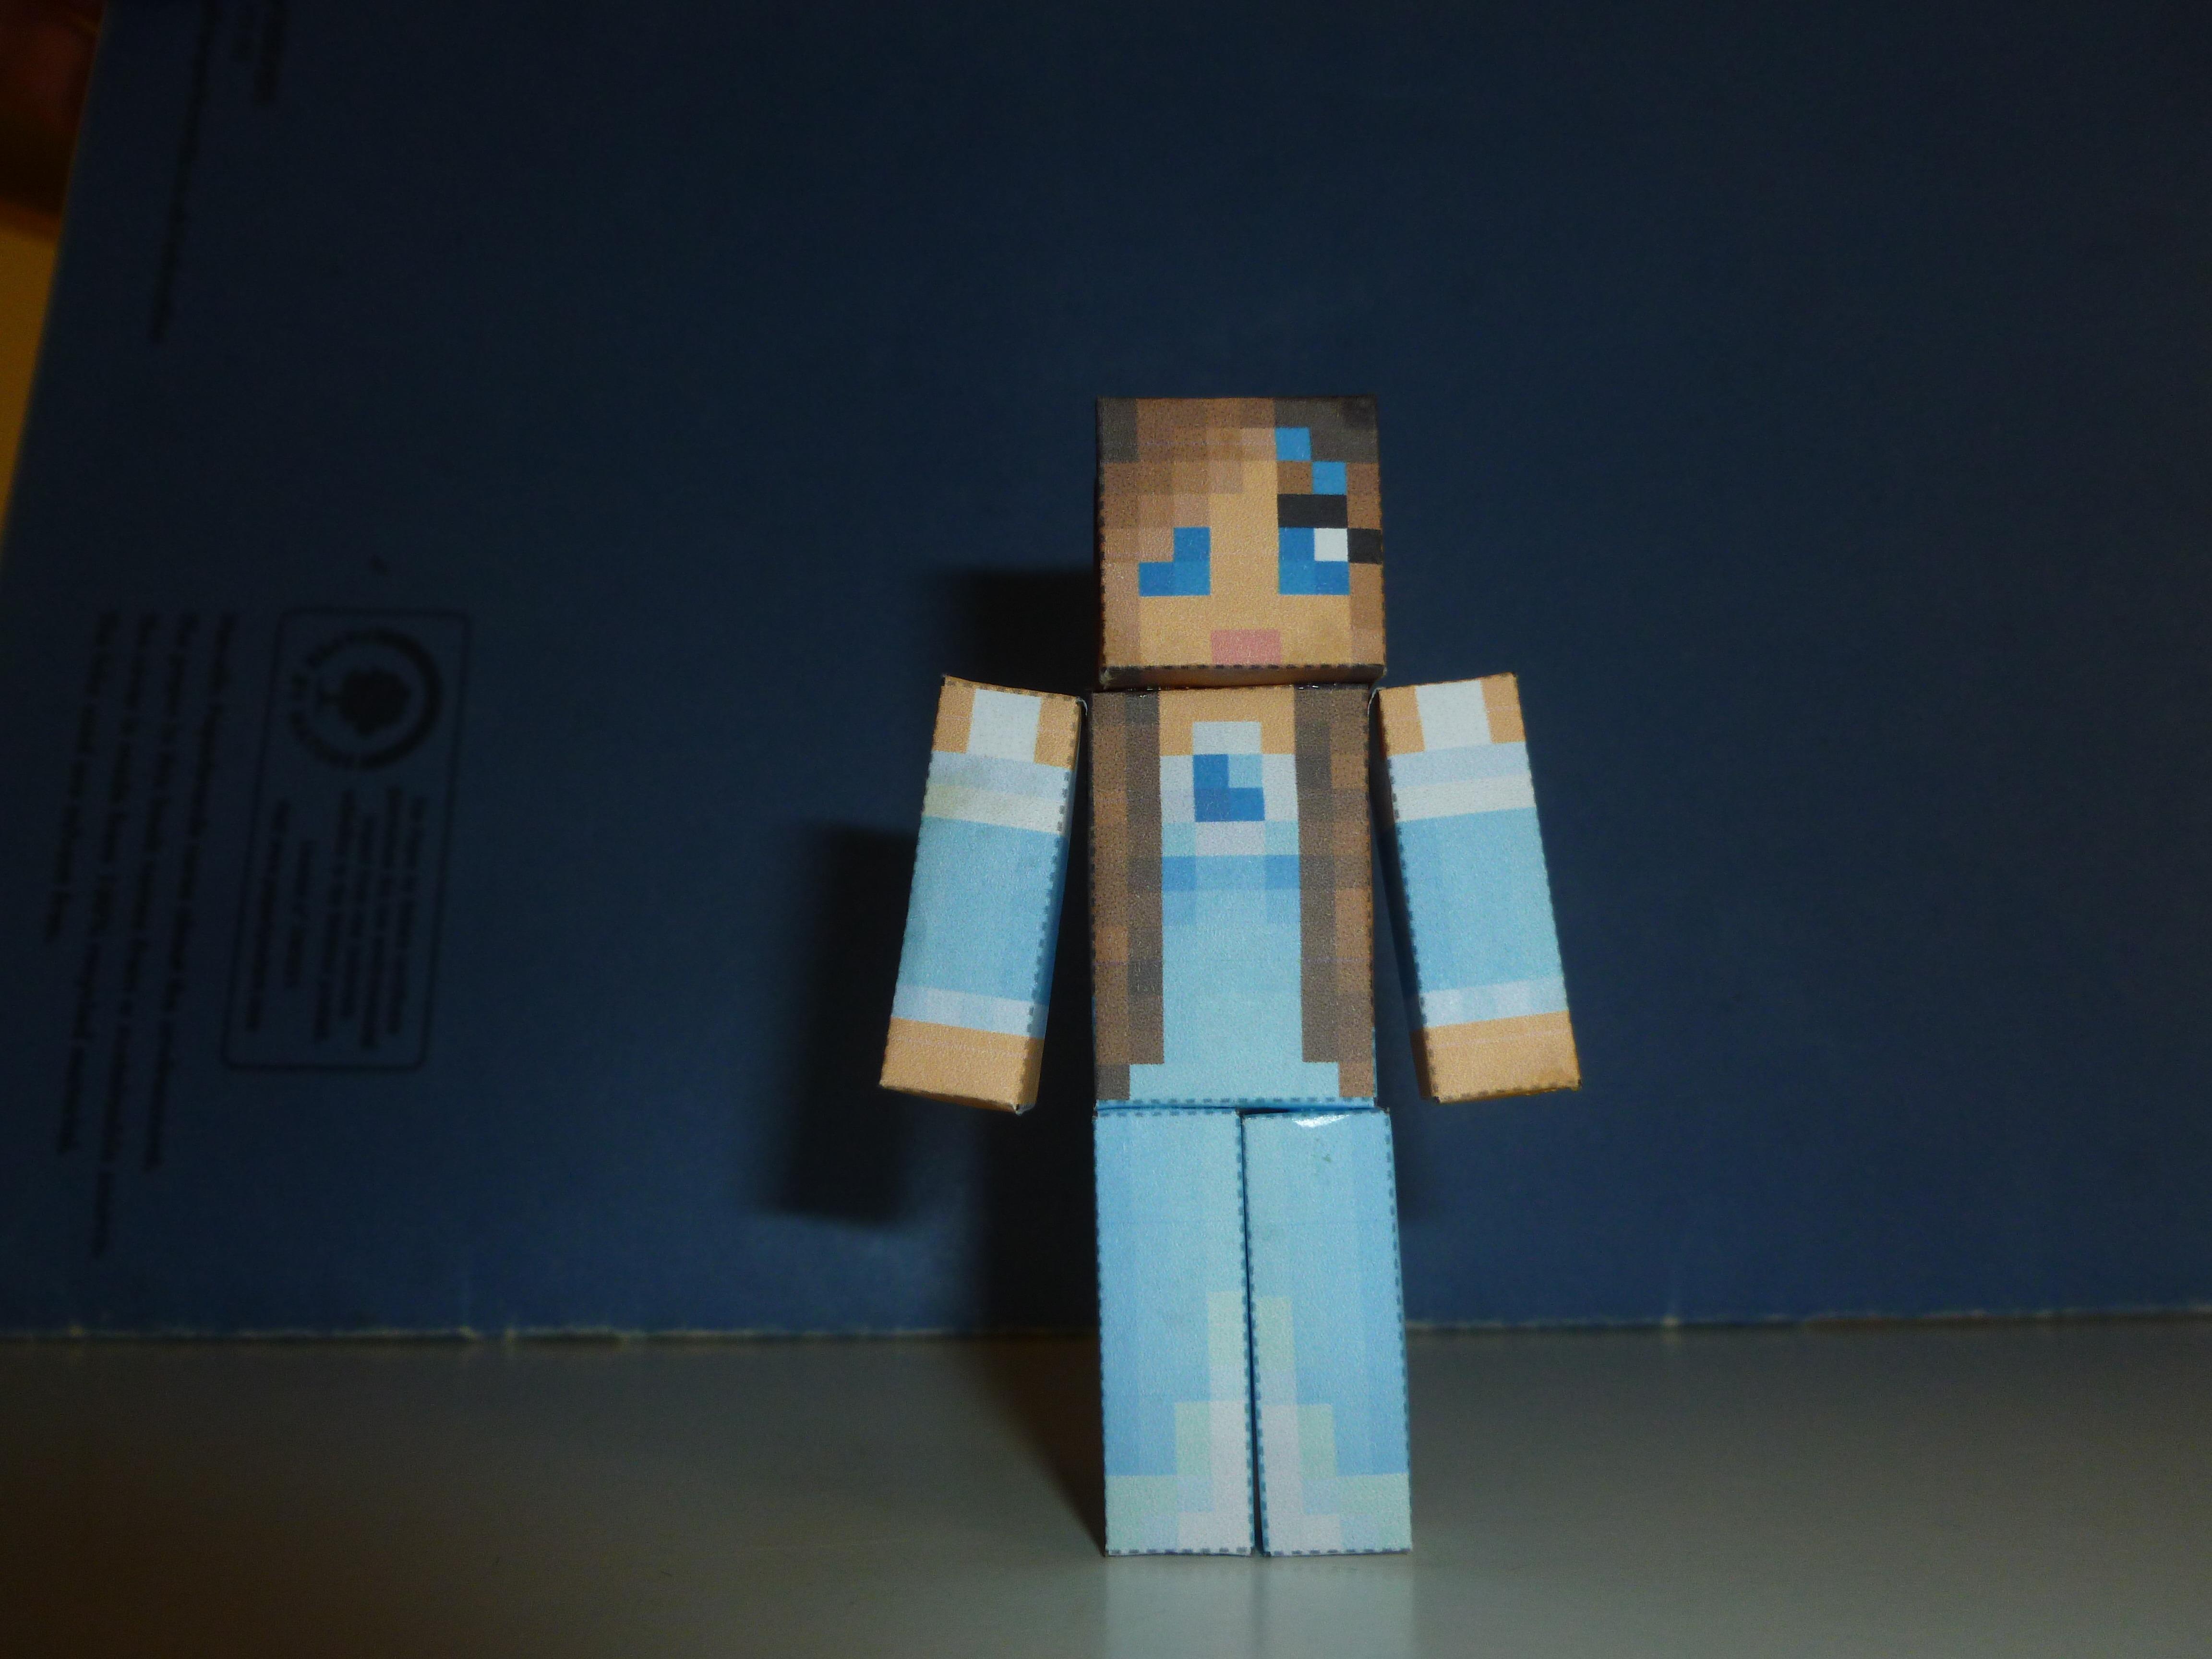 how to change my minecraft skin